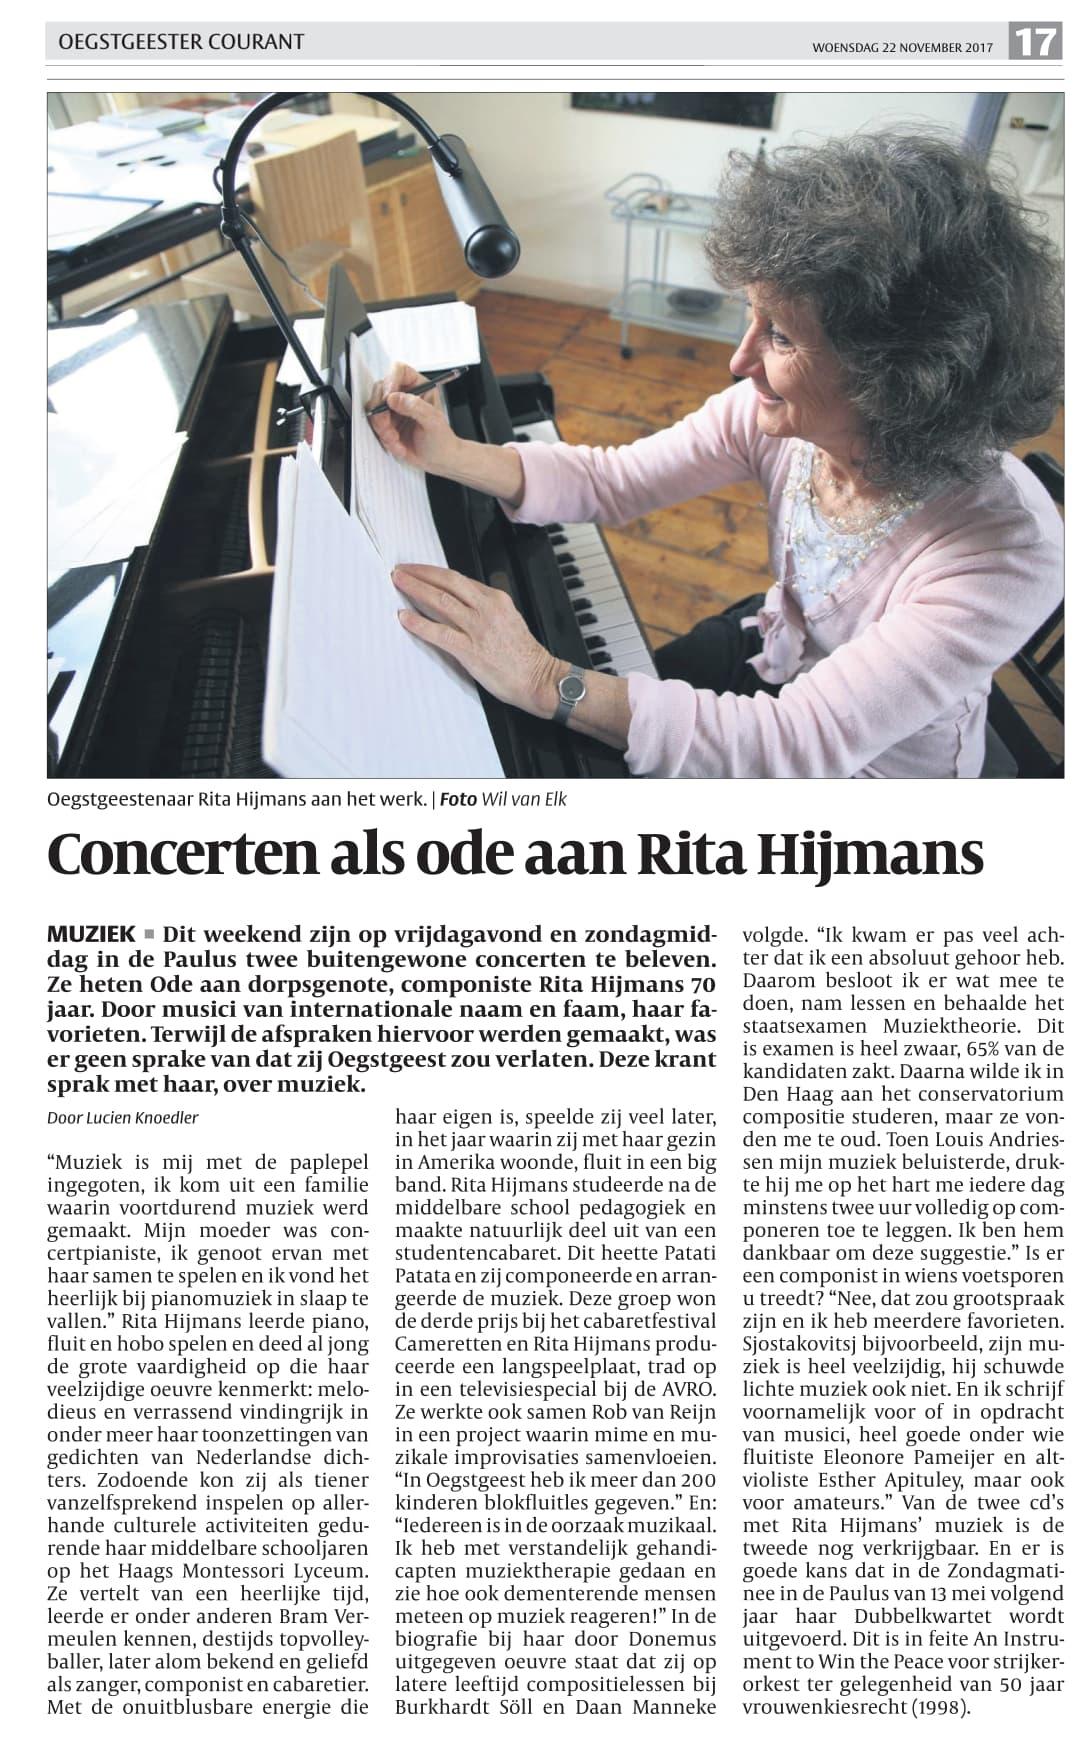 Ode aan Rita Hijmans